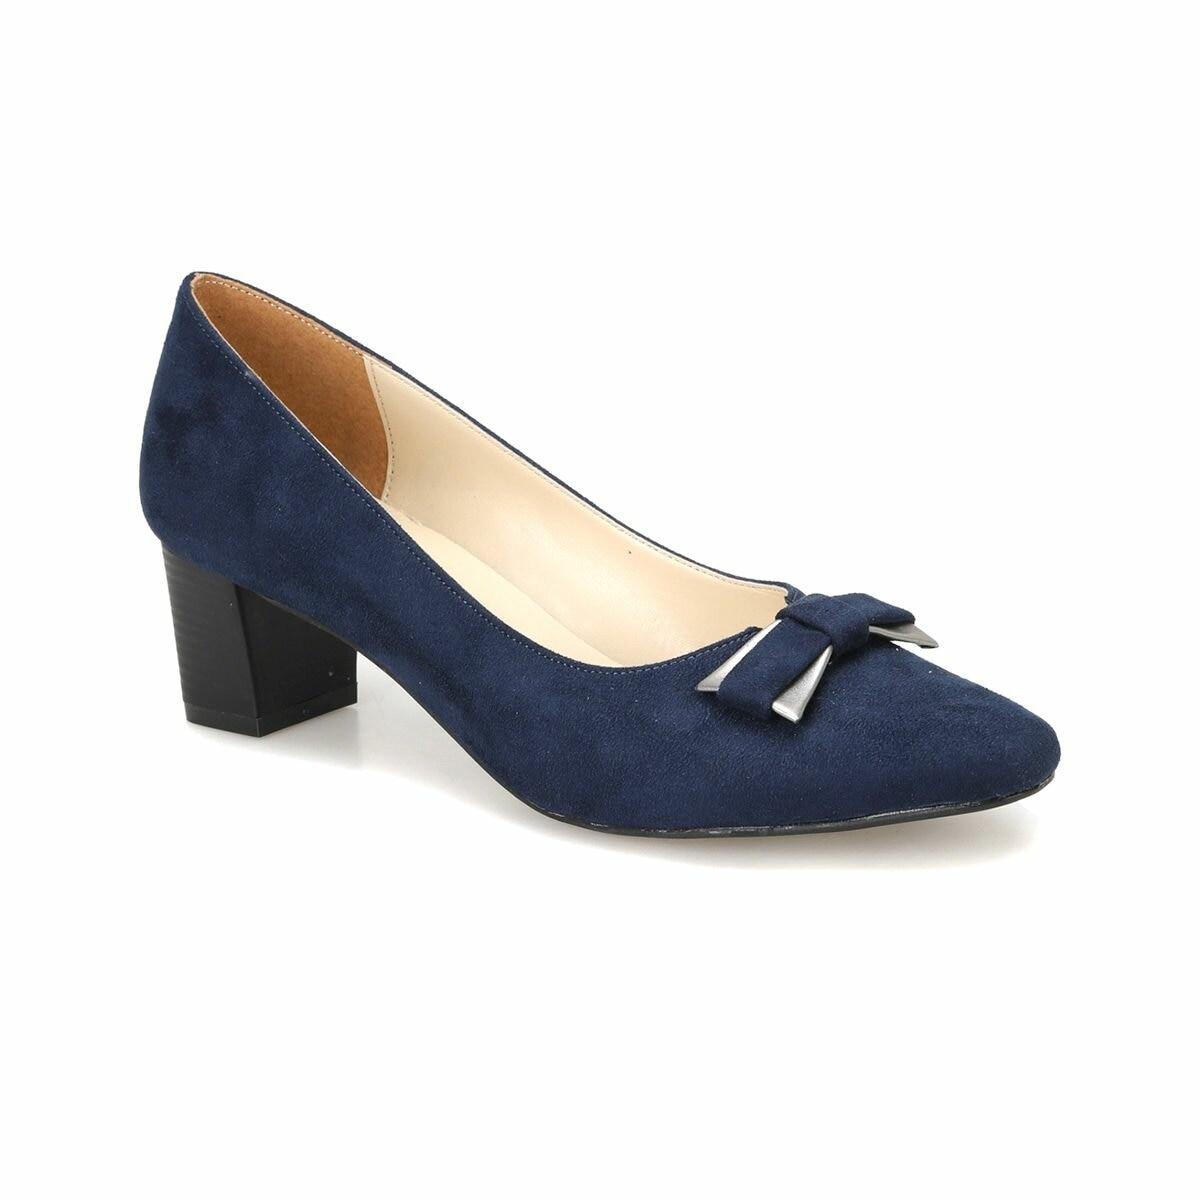 FLO DW18033 Navy Blue Women Gova Shoes Miss F